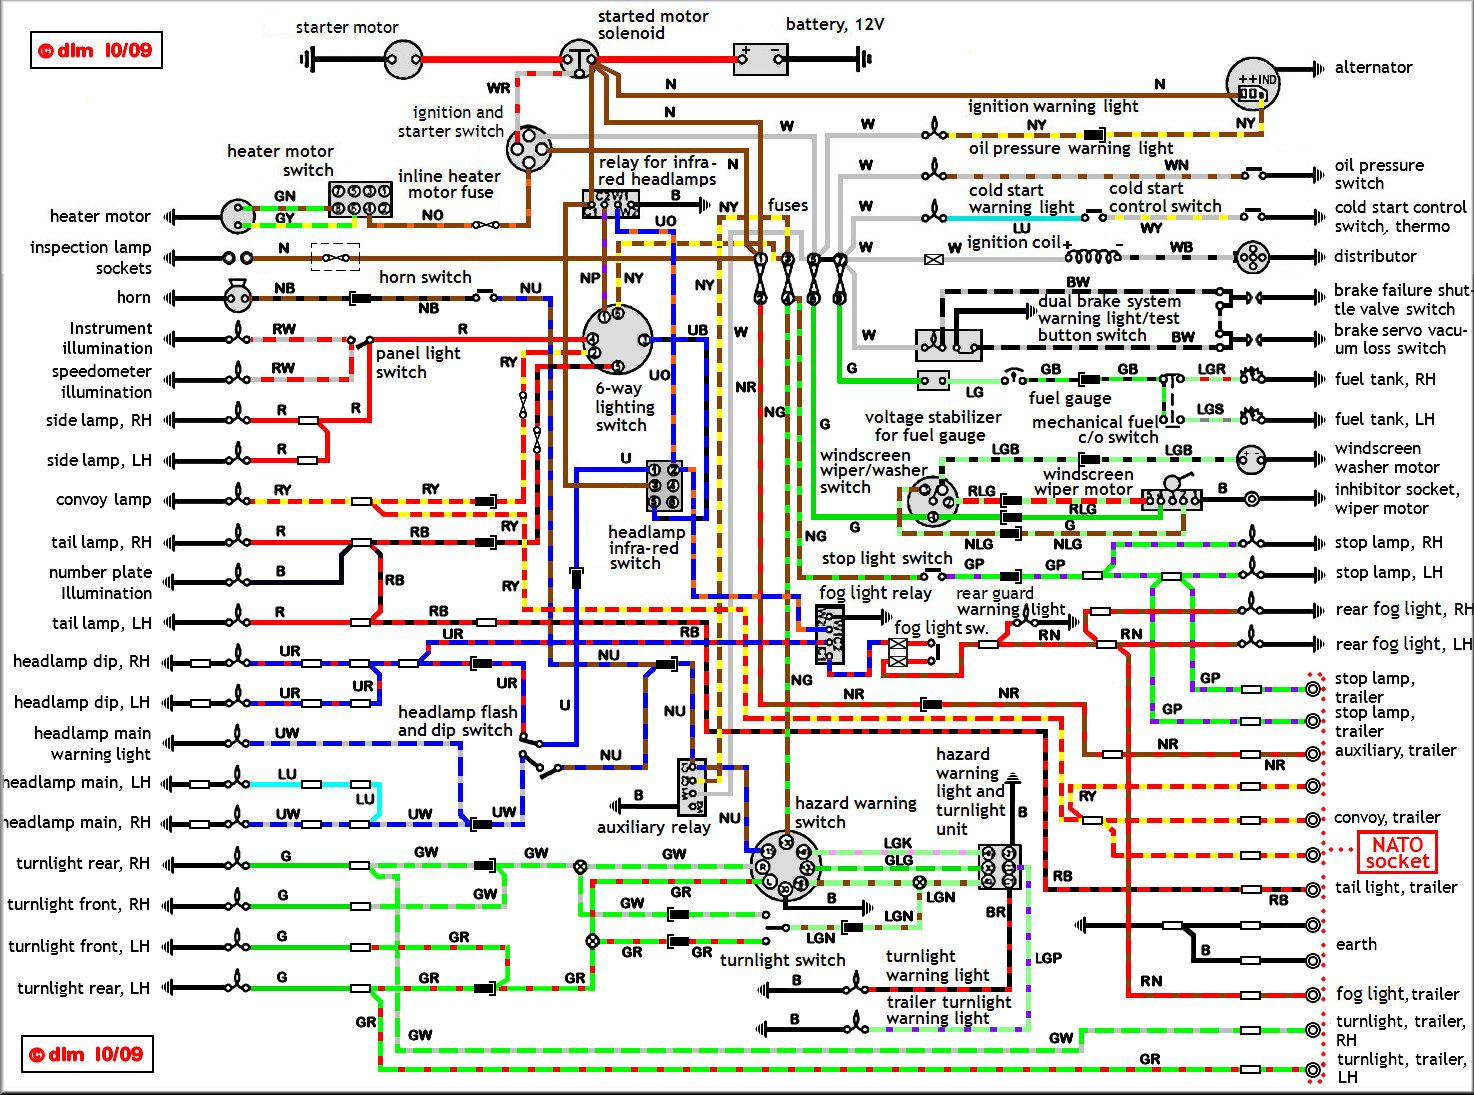 defender 90 wiring diagram electrical drawing wiring diagram u2022 defy ovens wiring diagrams land rover [ 1474 x 1095 Pixel ]